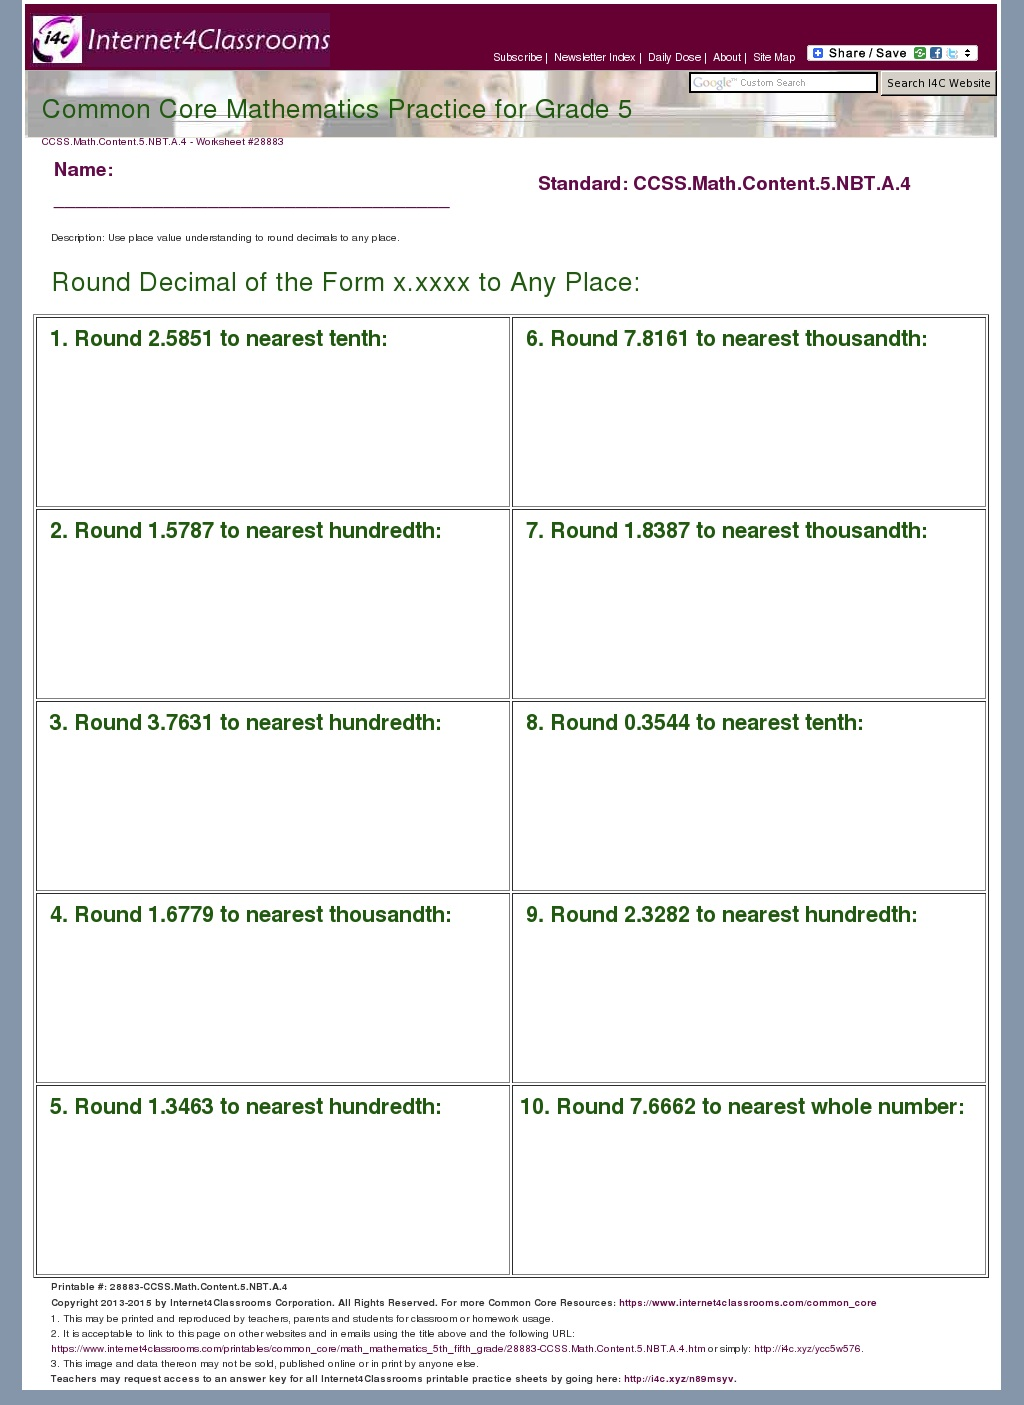 Description Download Worksheet 28883 Ccss Math Content